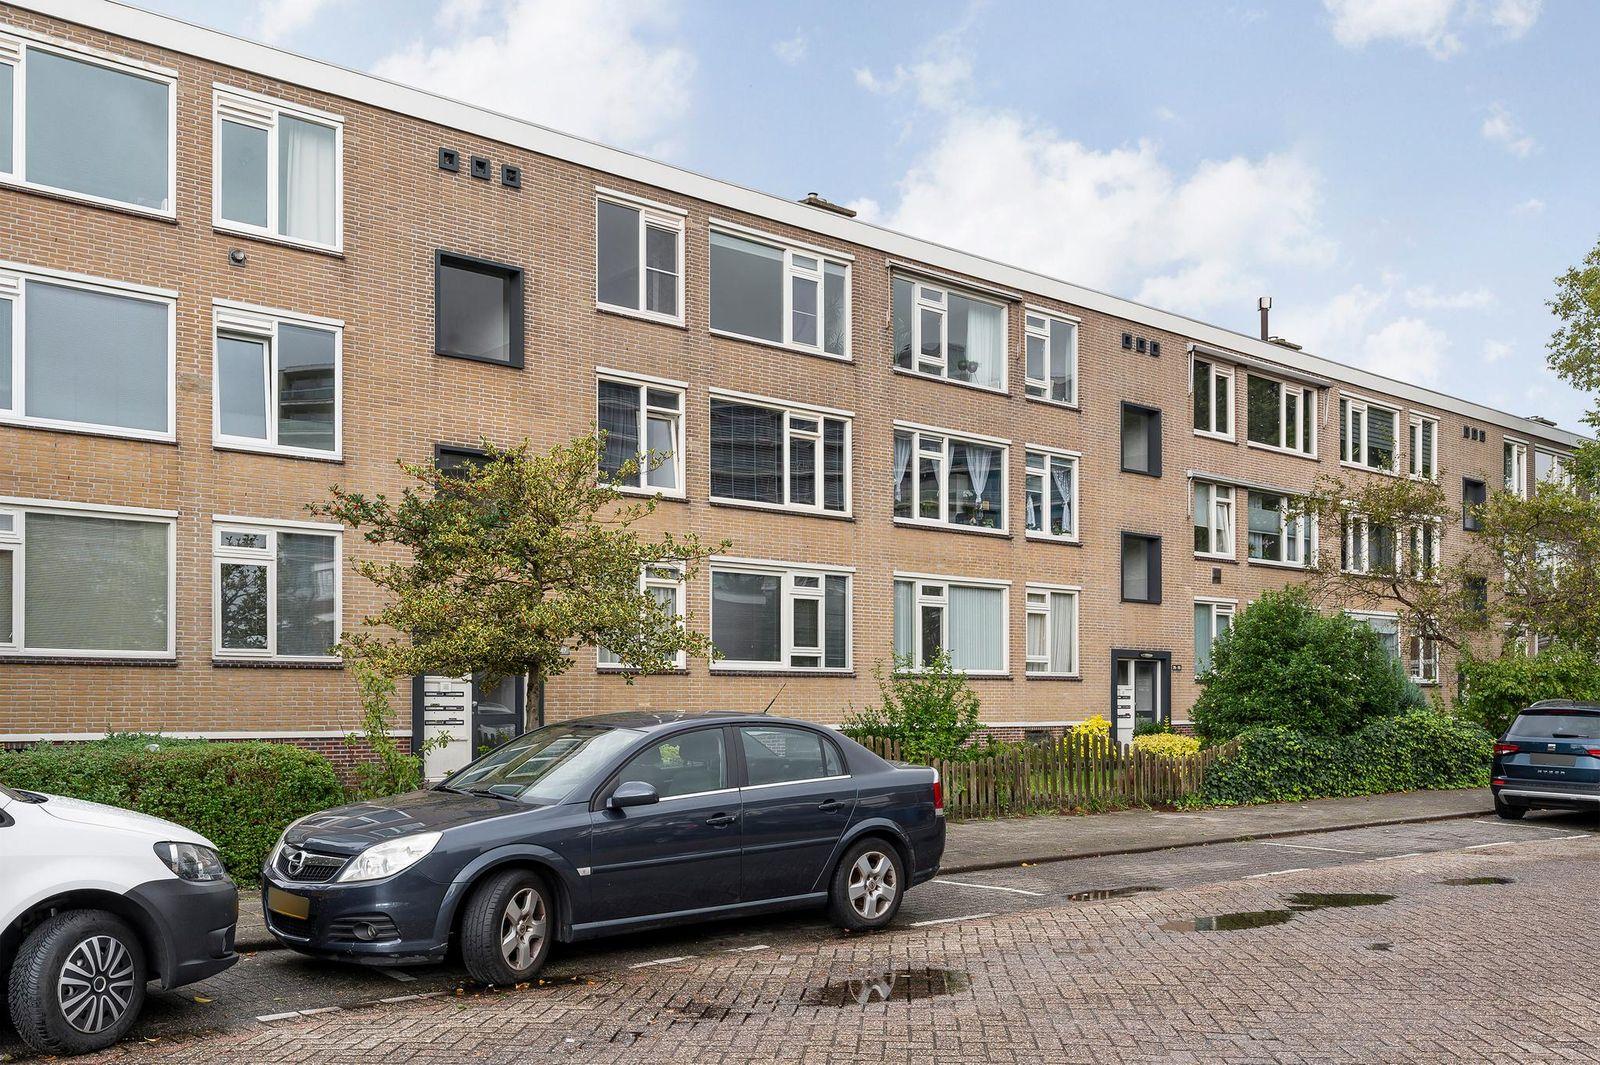 Prins der Nederlandenstraat 41, Hoek Van Holland